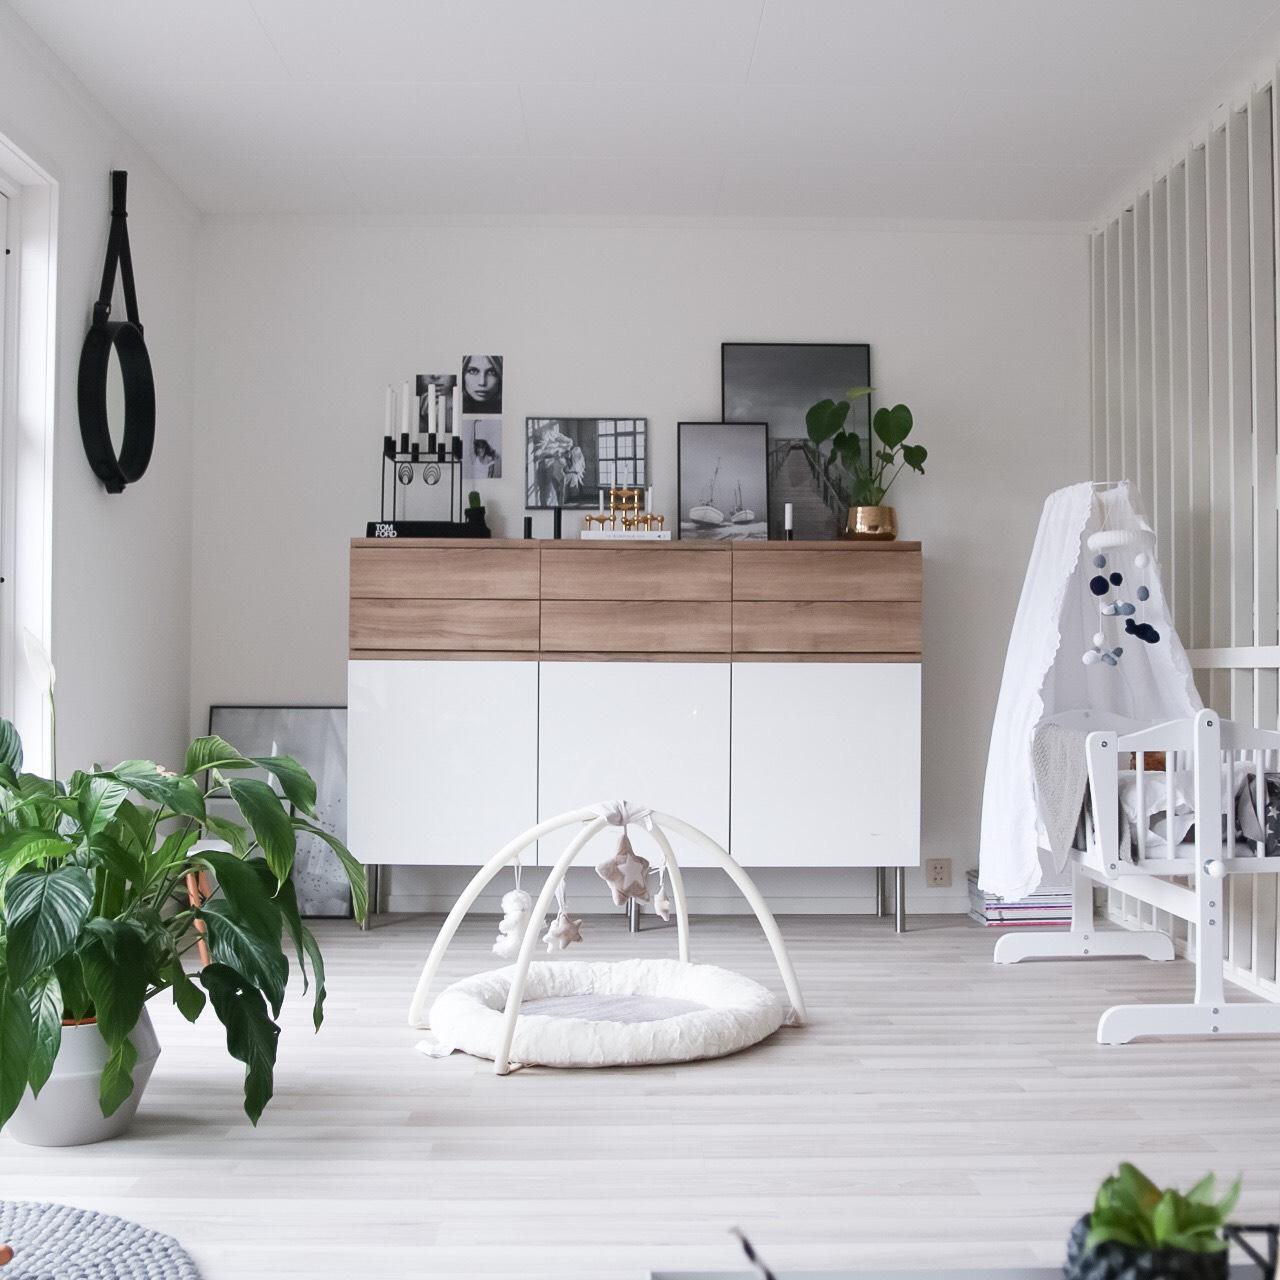 Vår mest «populære» møbel